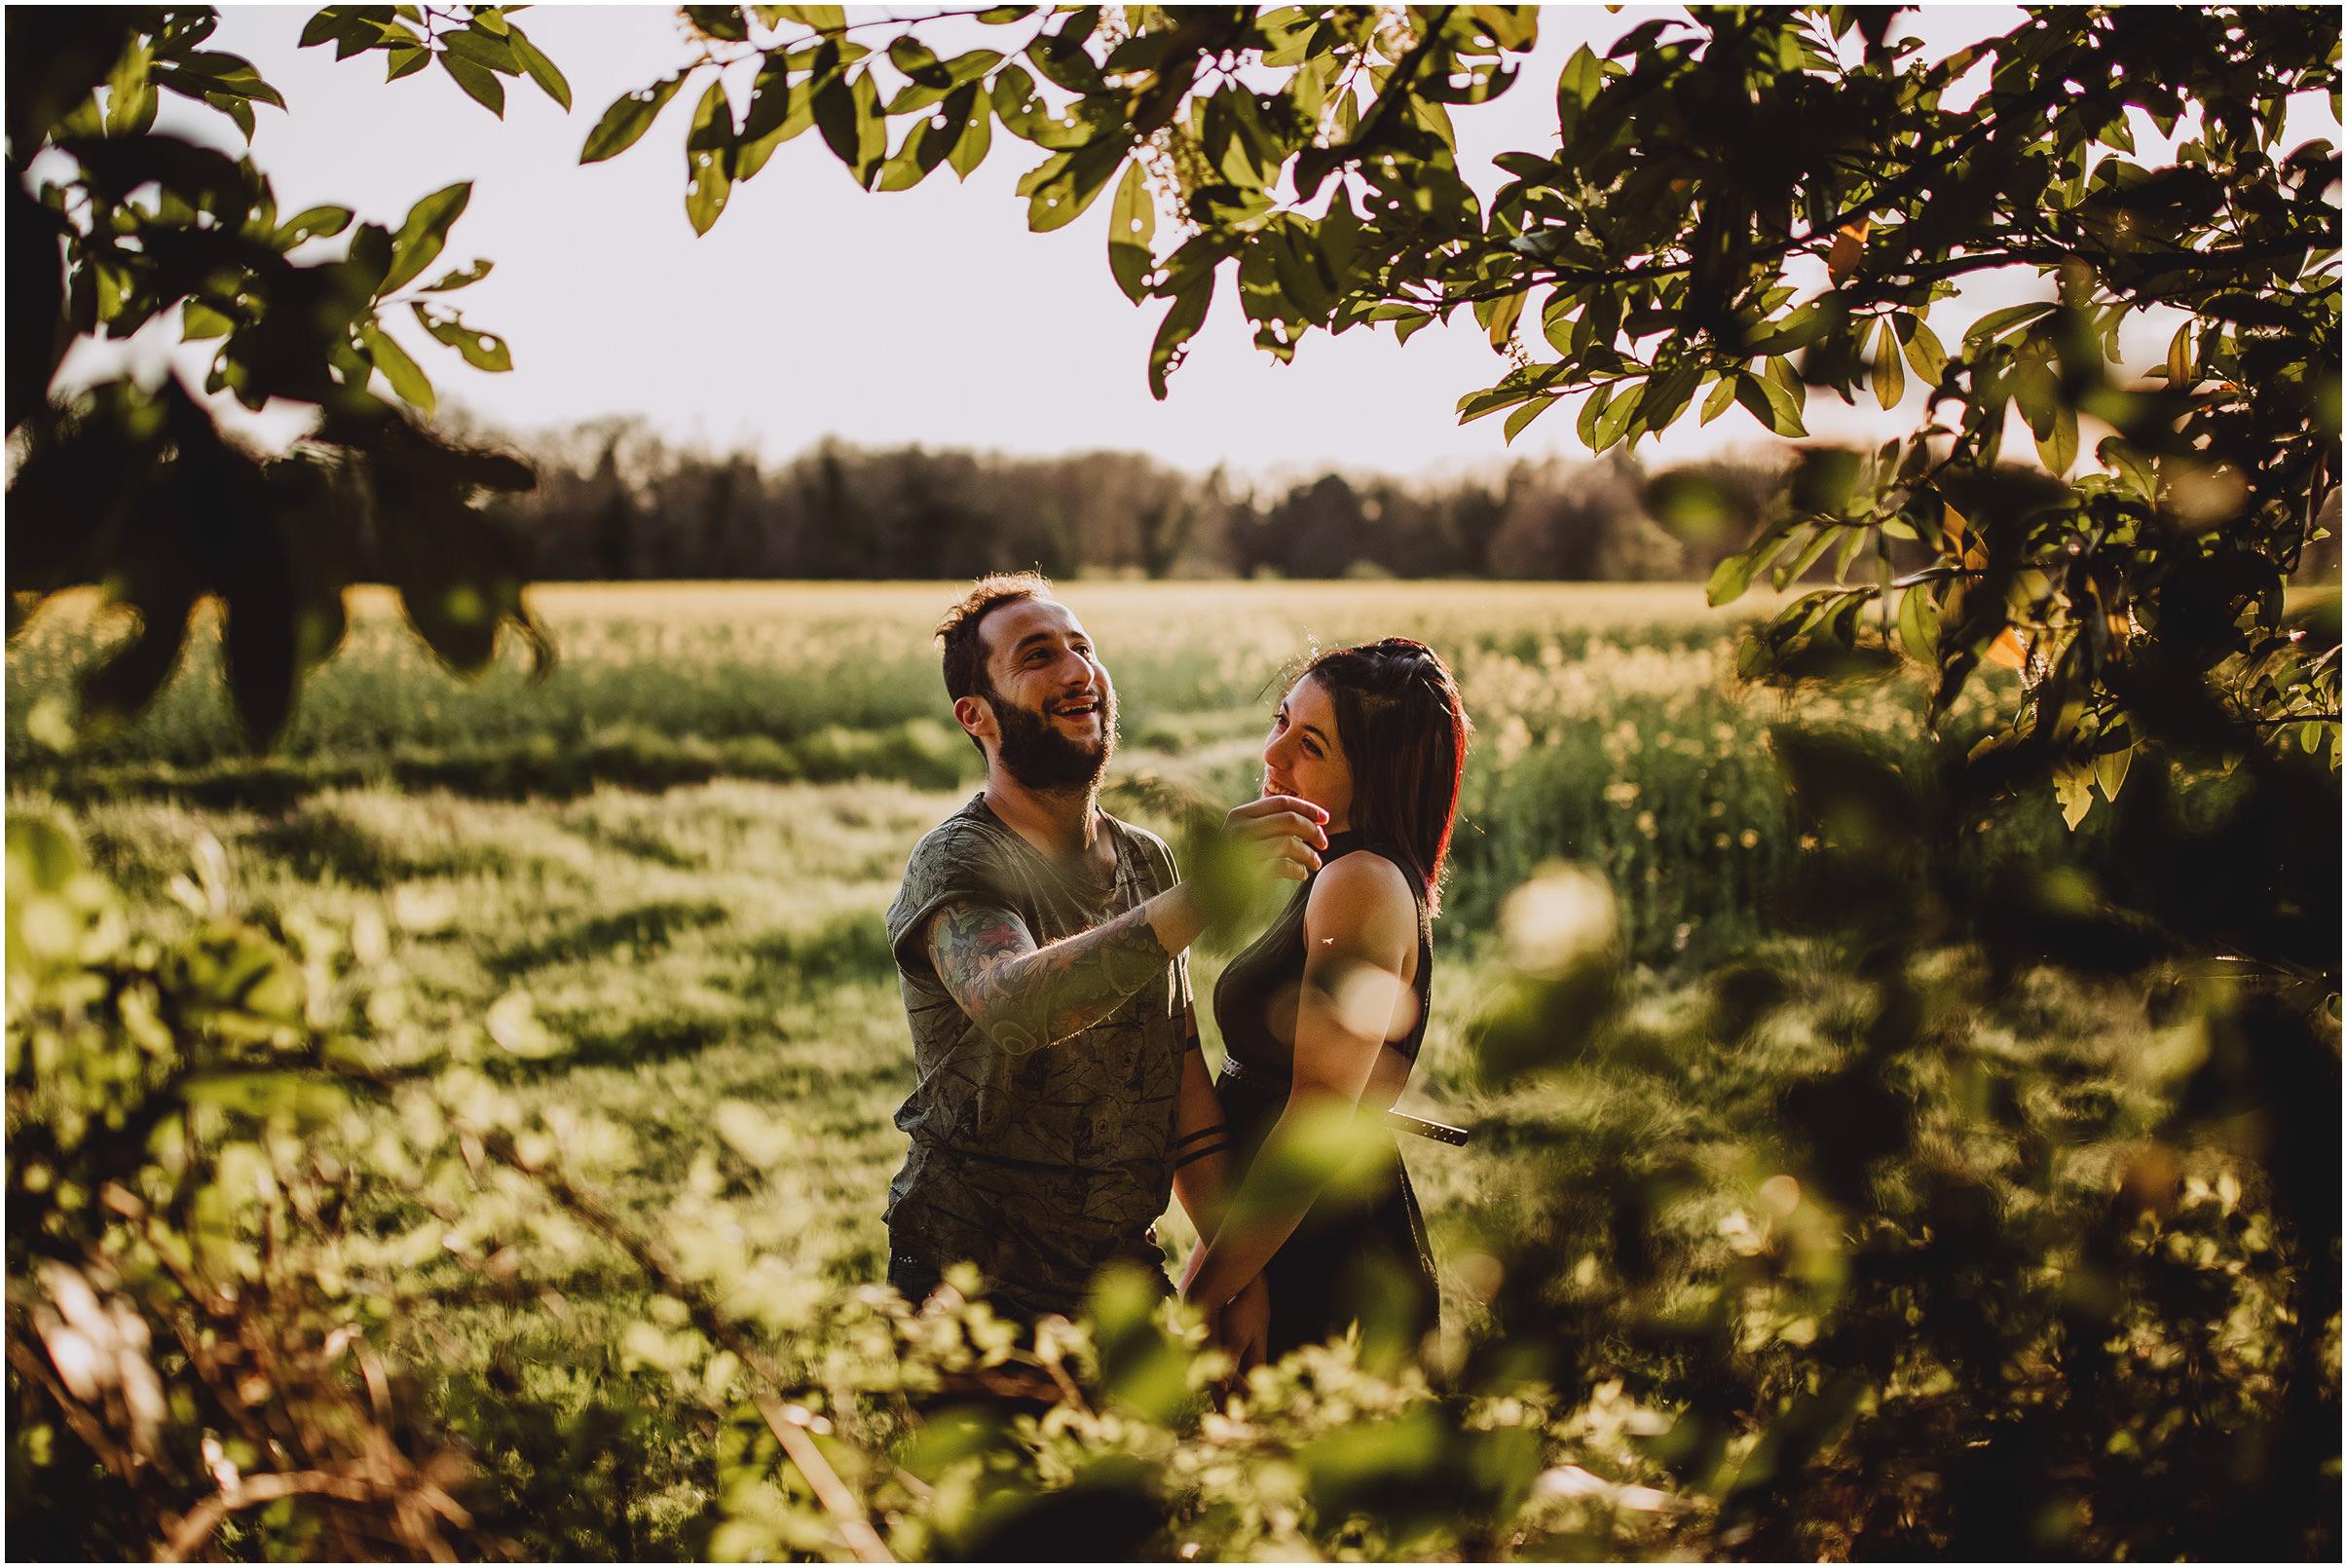 coppia-lovesession-marta-nicola-sara-lorenzoni-fotografia-wedding-matrimonio-arezzo-05